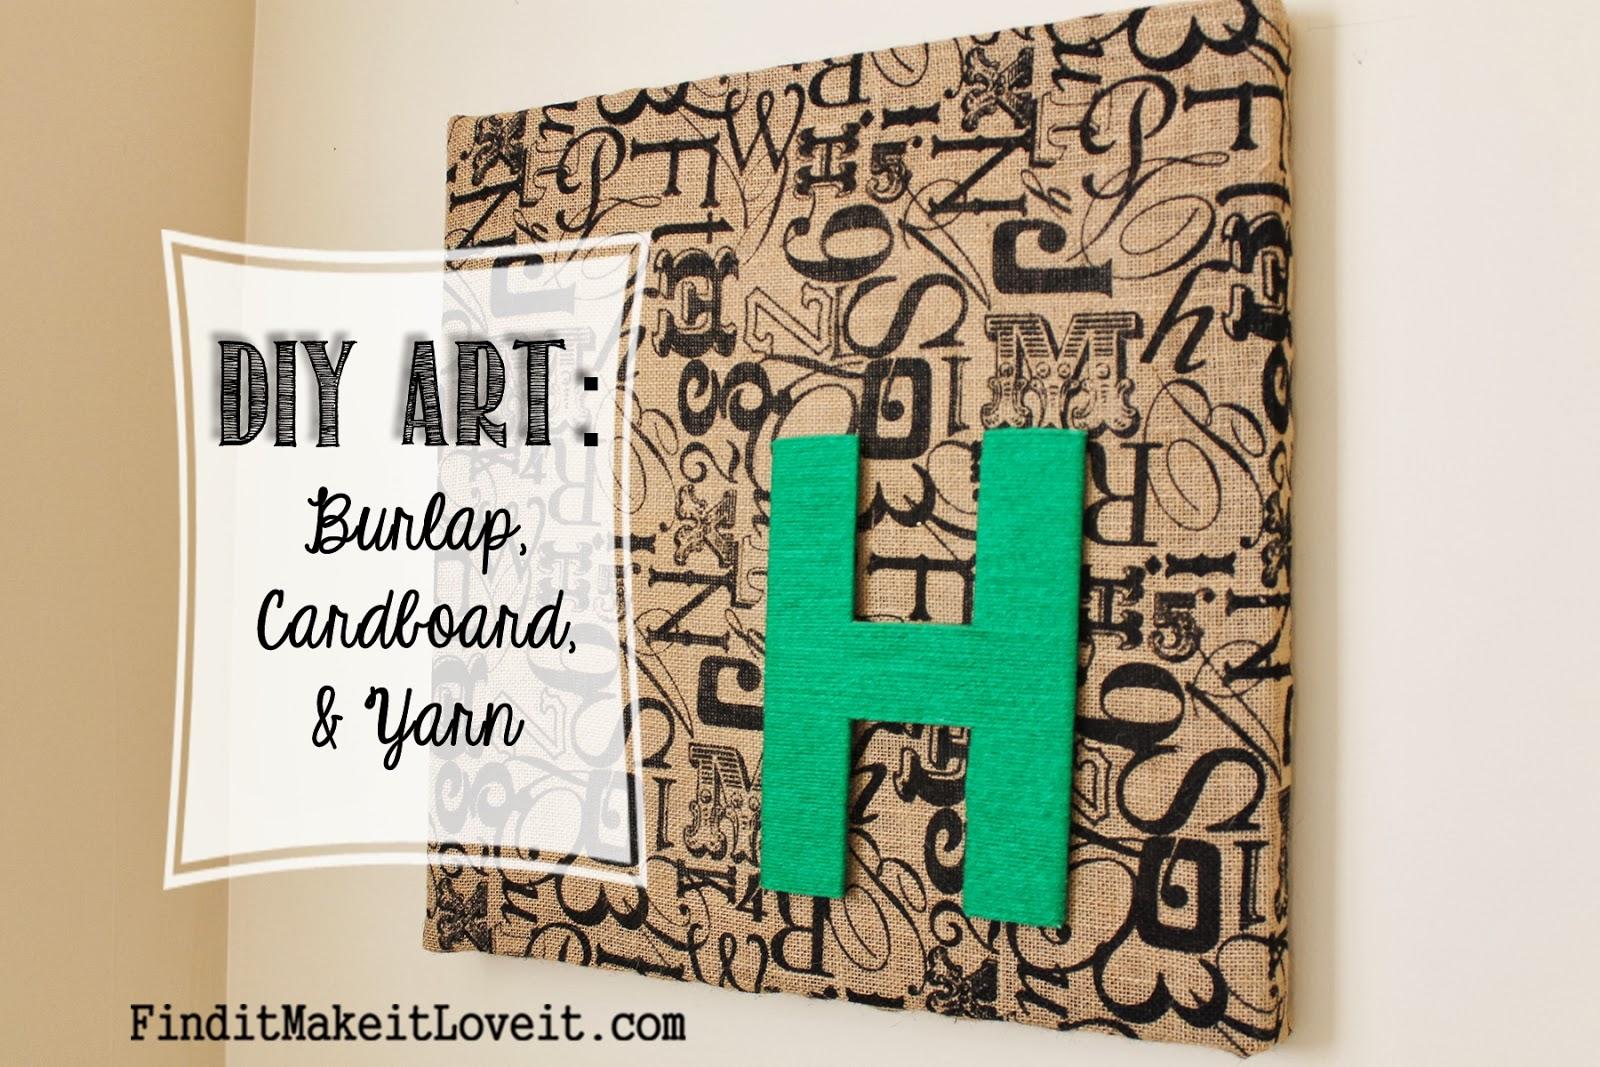 http://www.finditmakeitloveit.com/2014/01/diy-art-burlap-cardboard-yarn.html